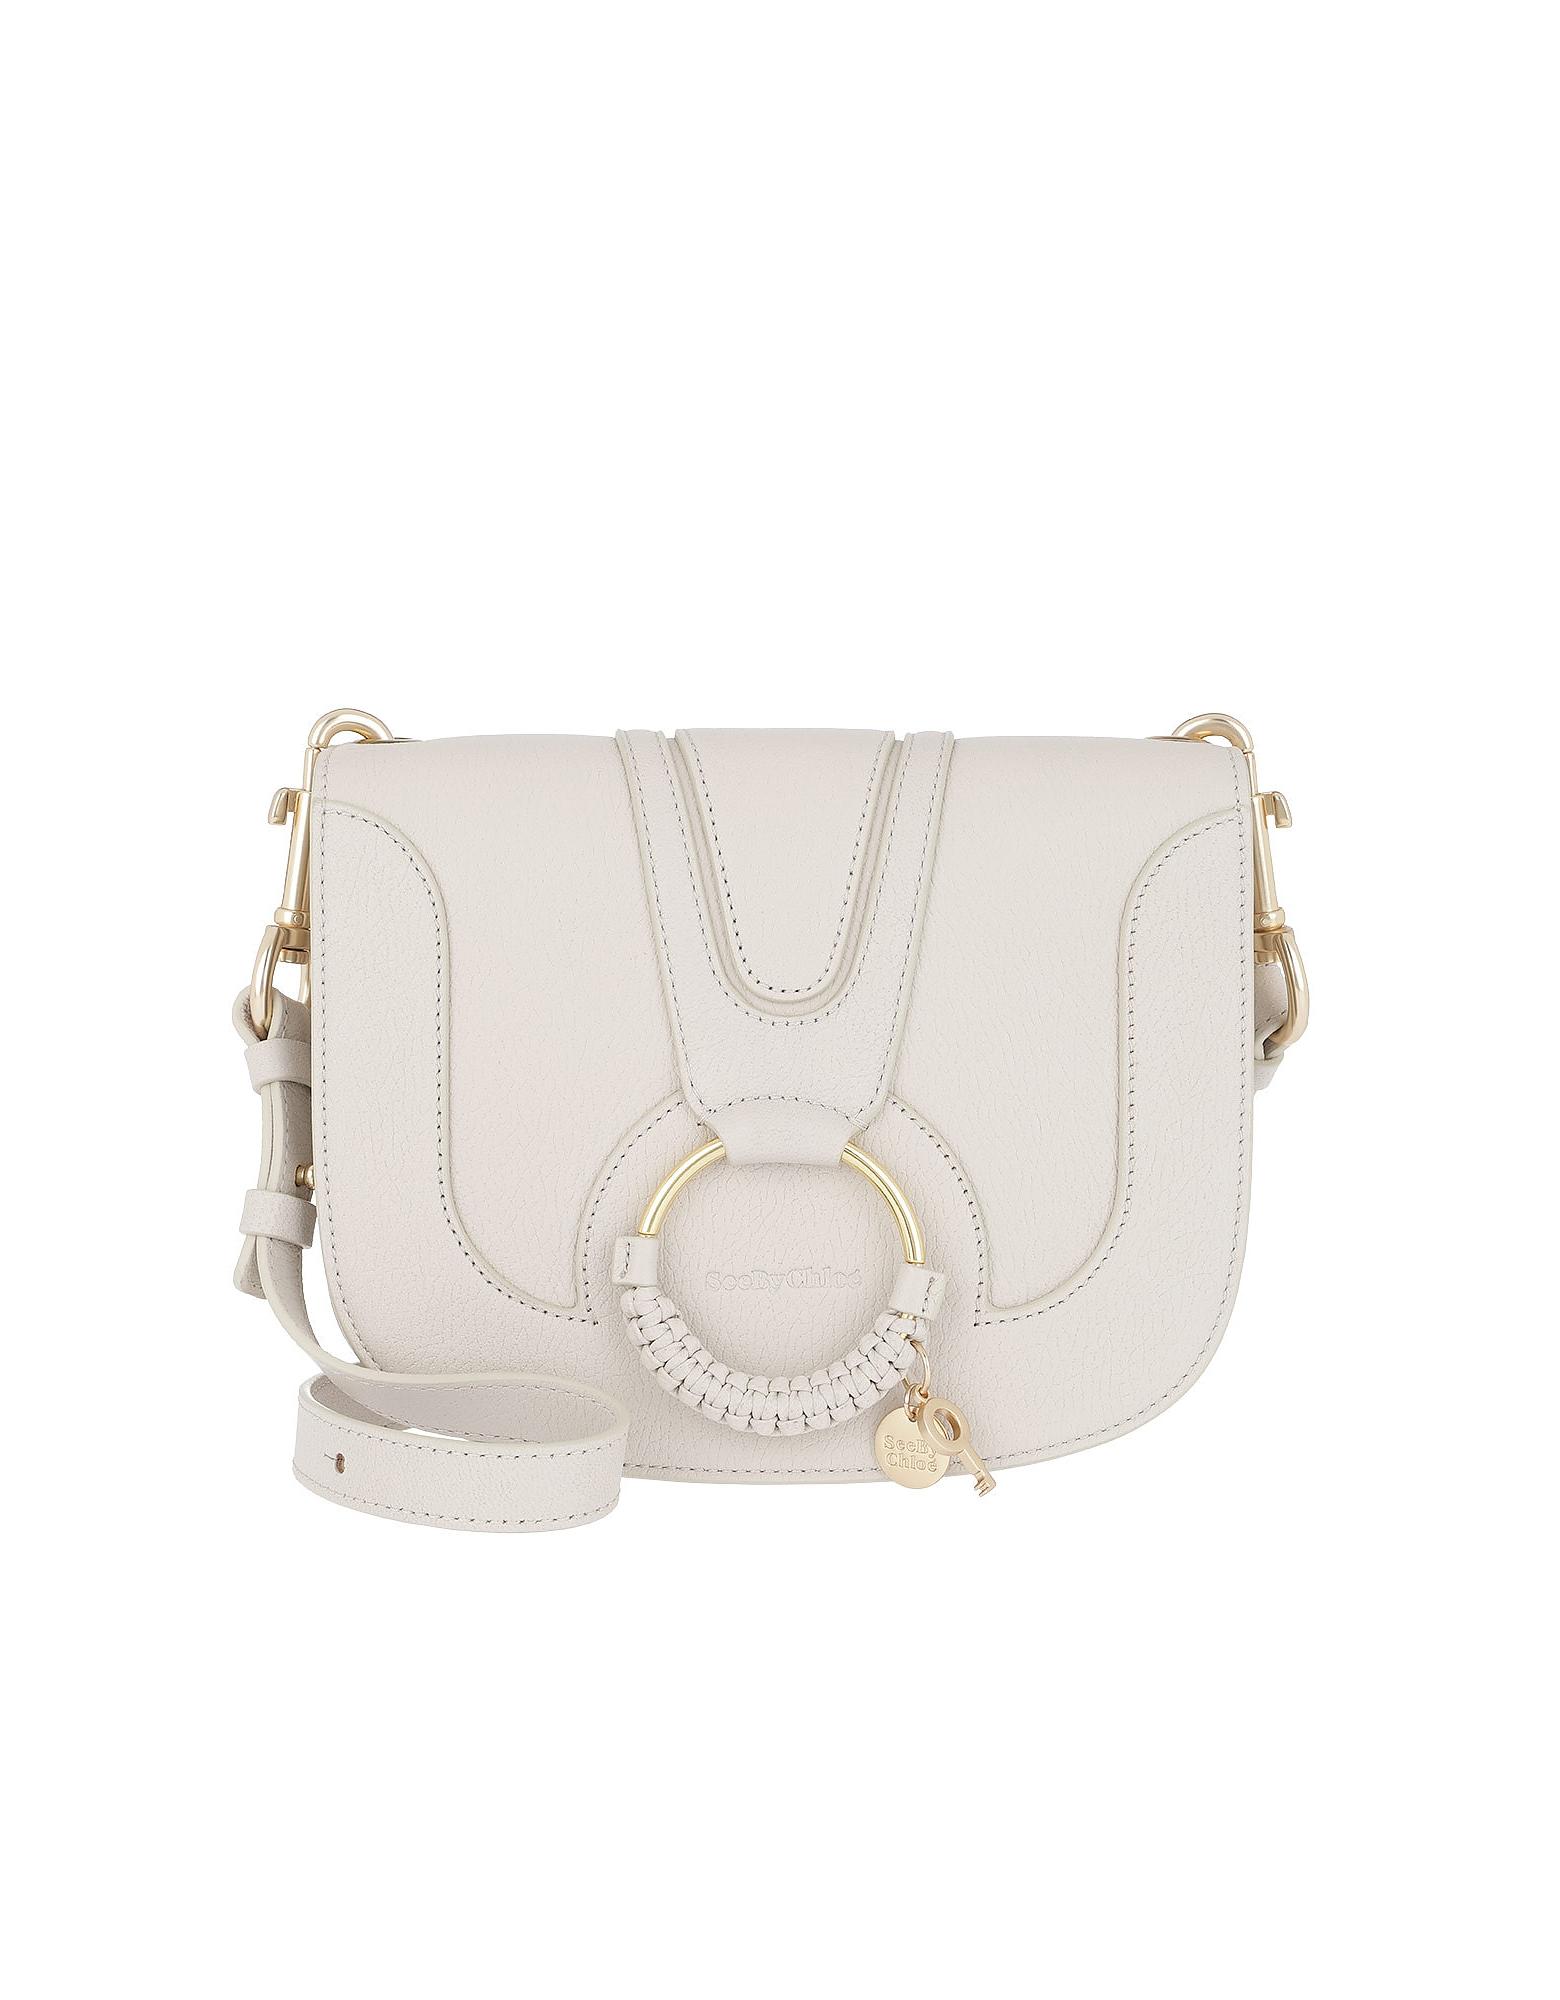 See by Chloé Handbags, Hana Medium Shoulder Bag Cement Beige